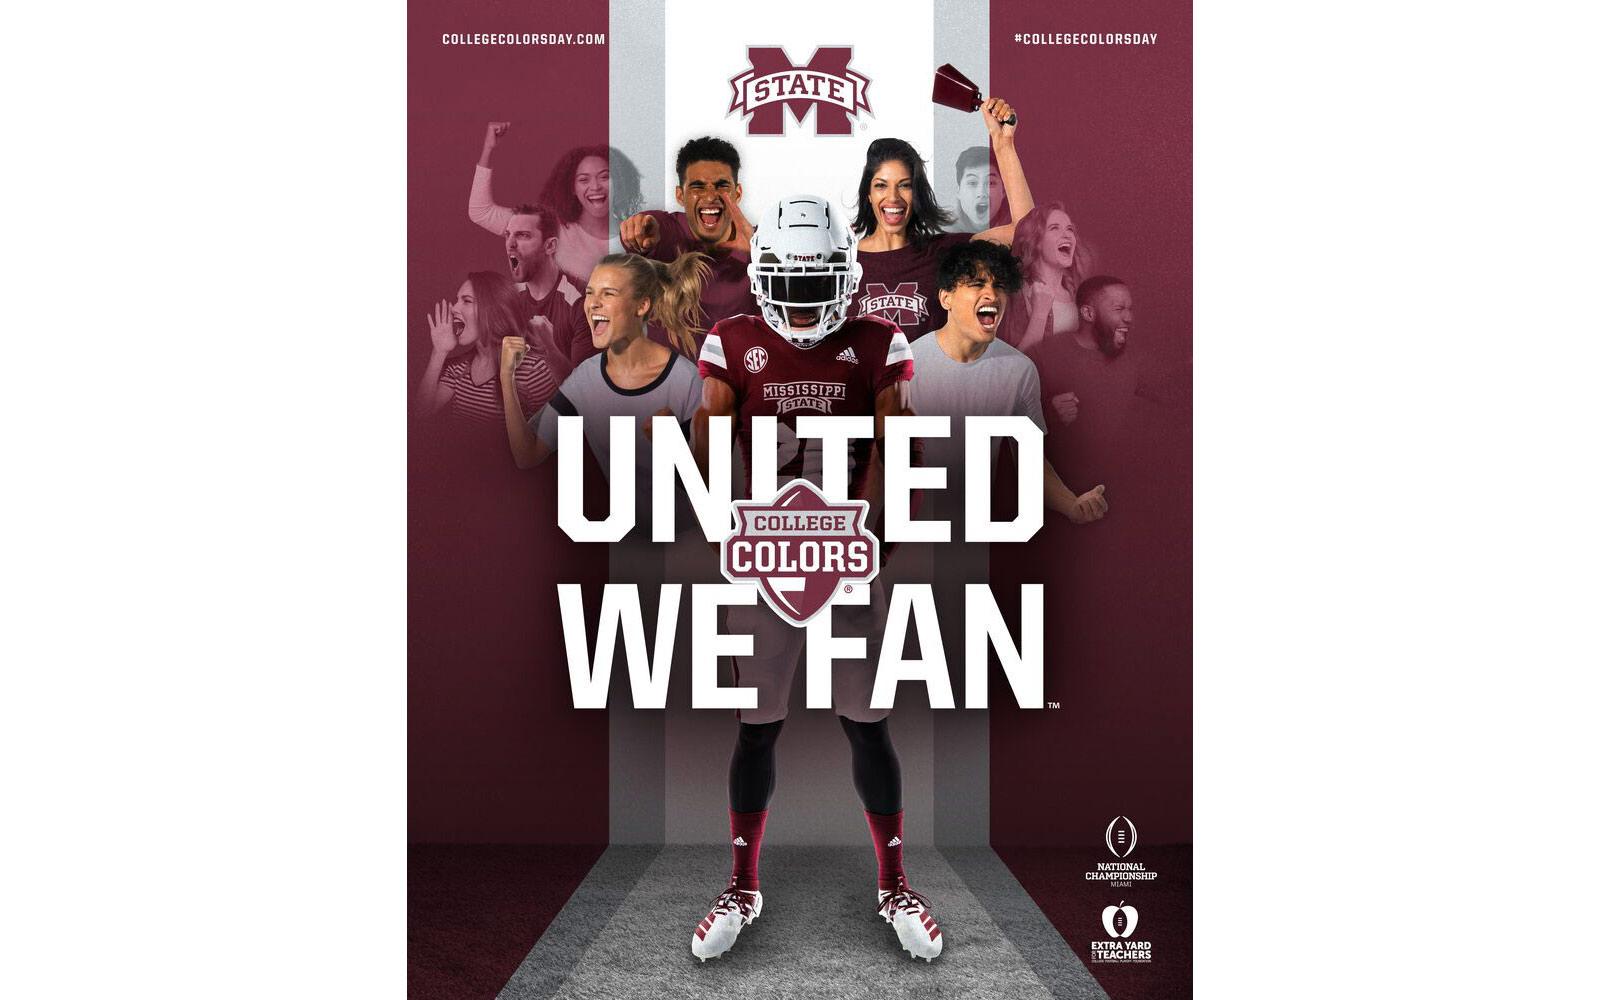 United We Fan 2020 featured.'